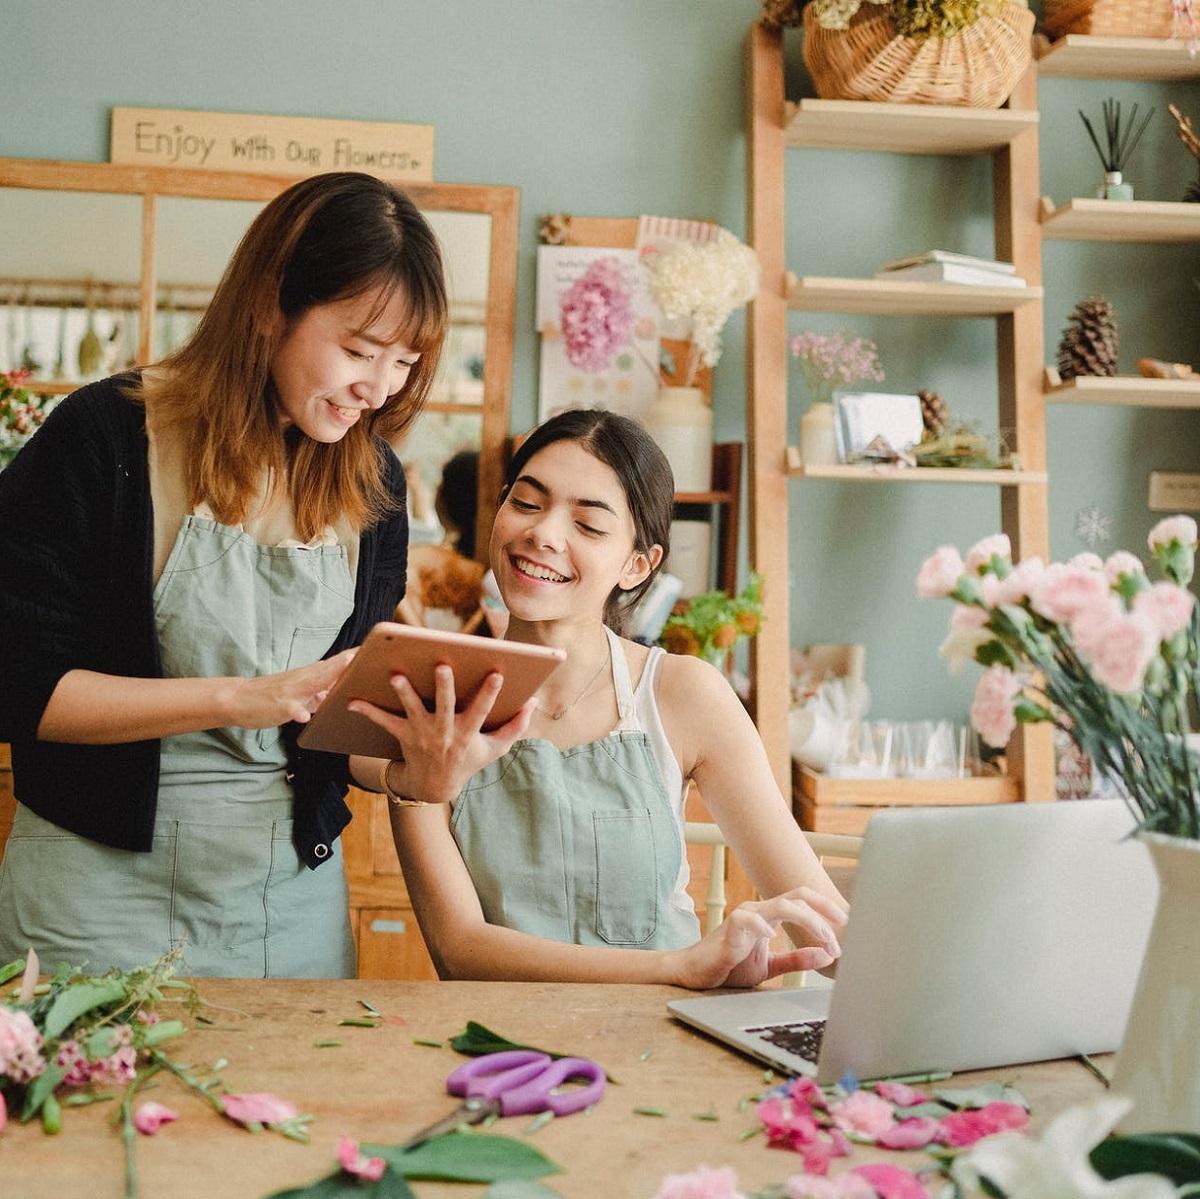 idei-afaceri-online-profitabile-in-romania